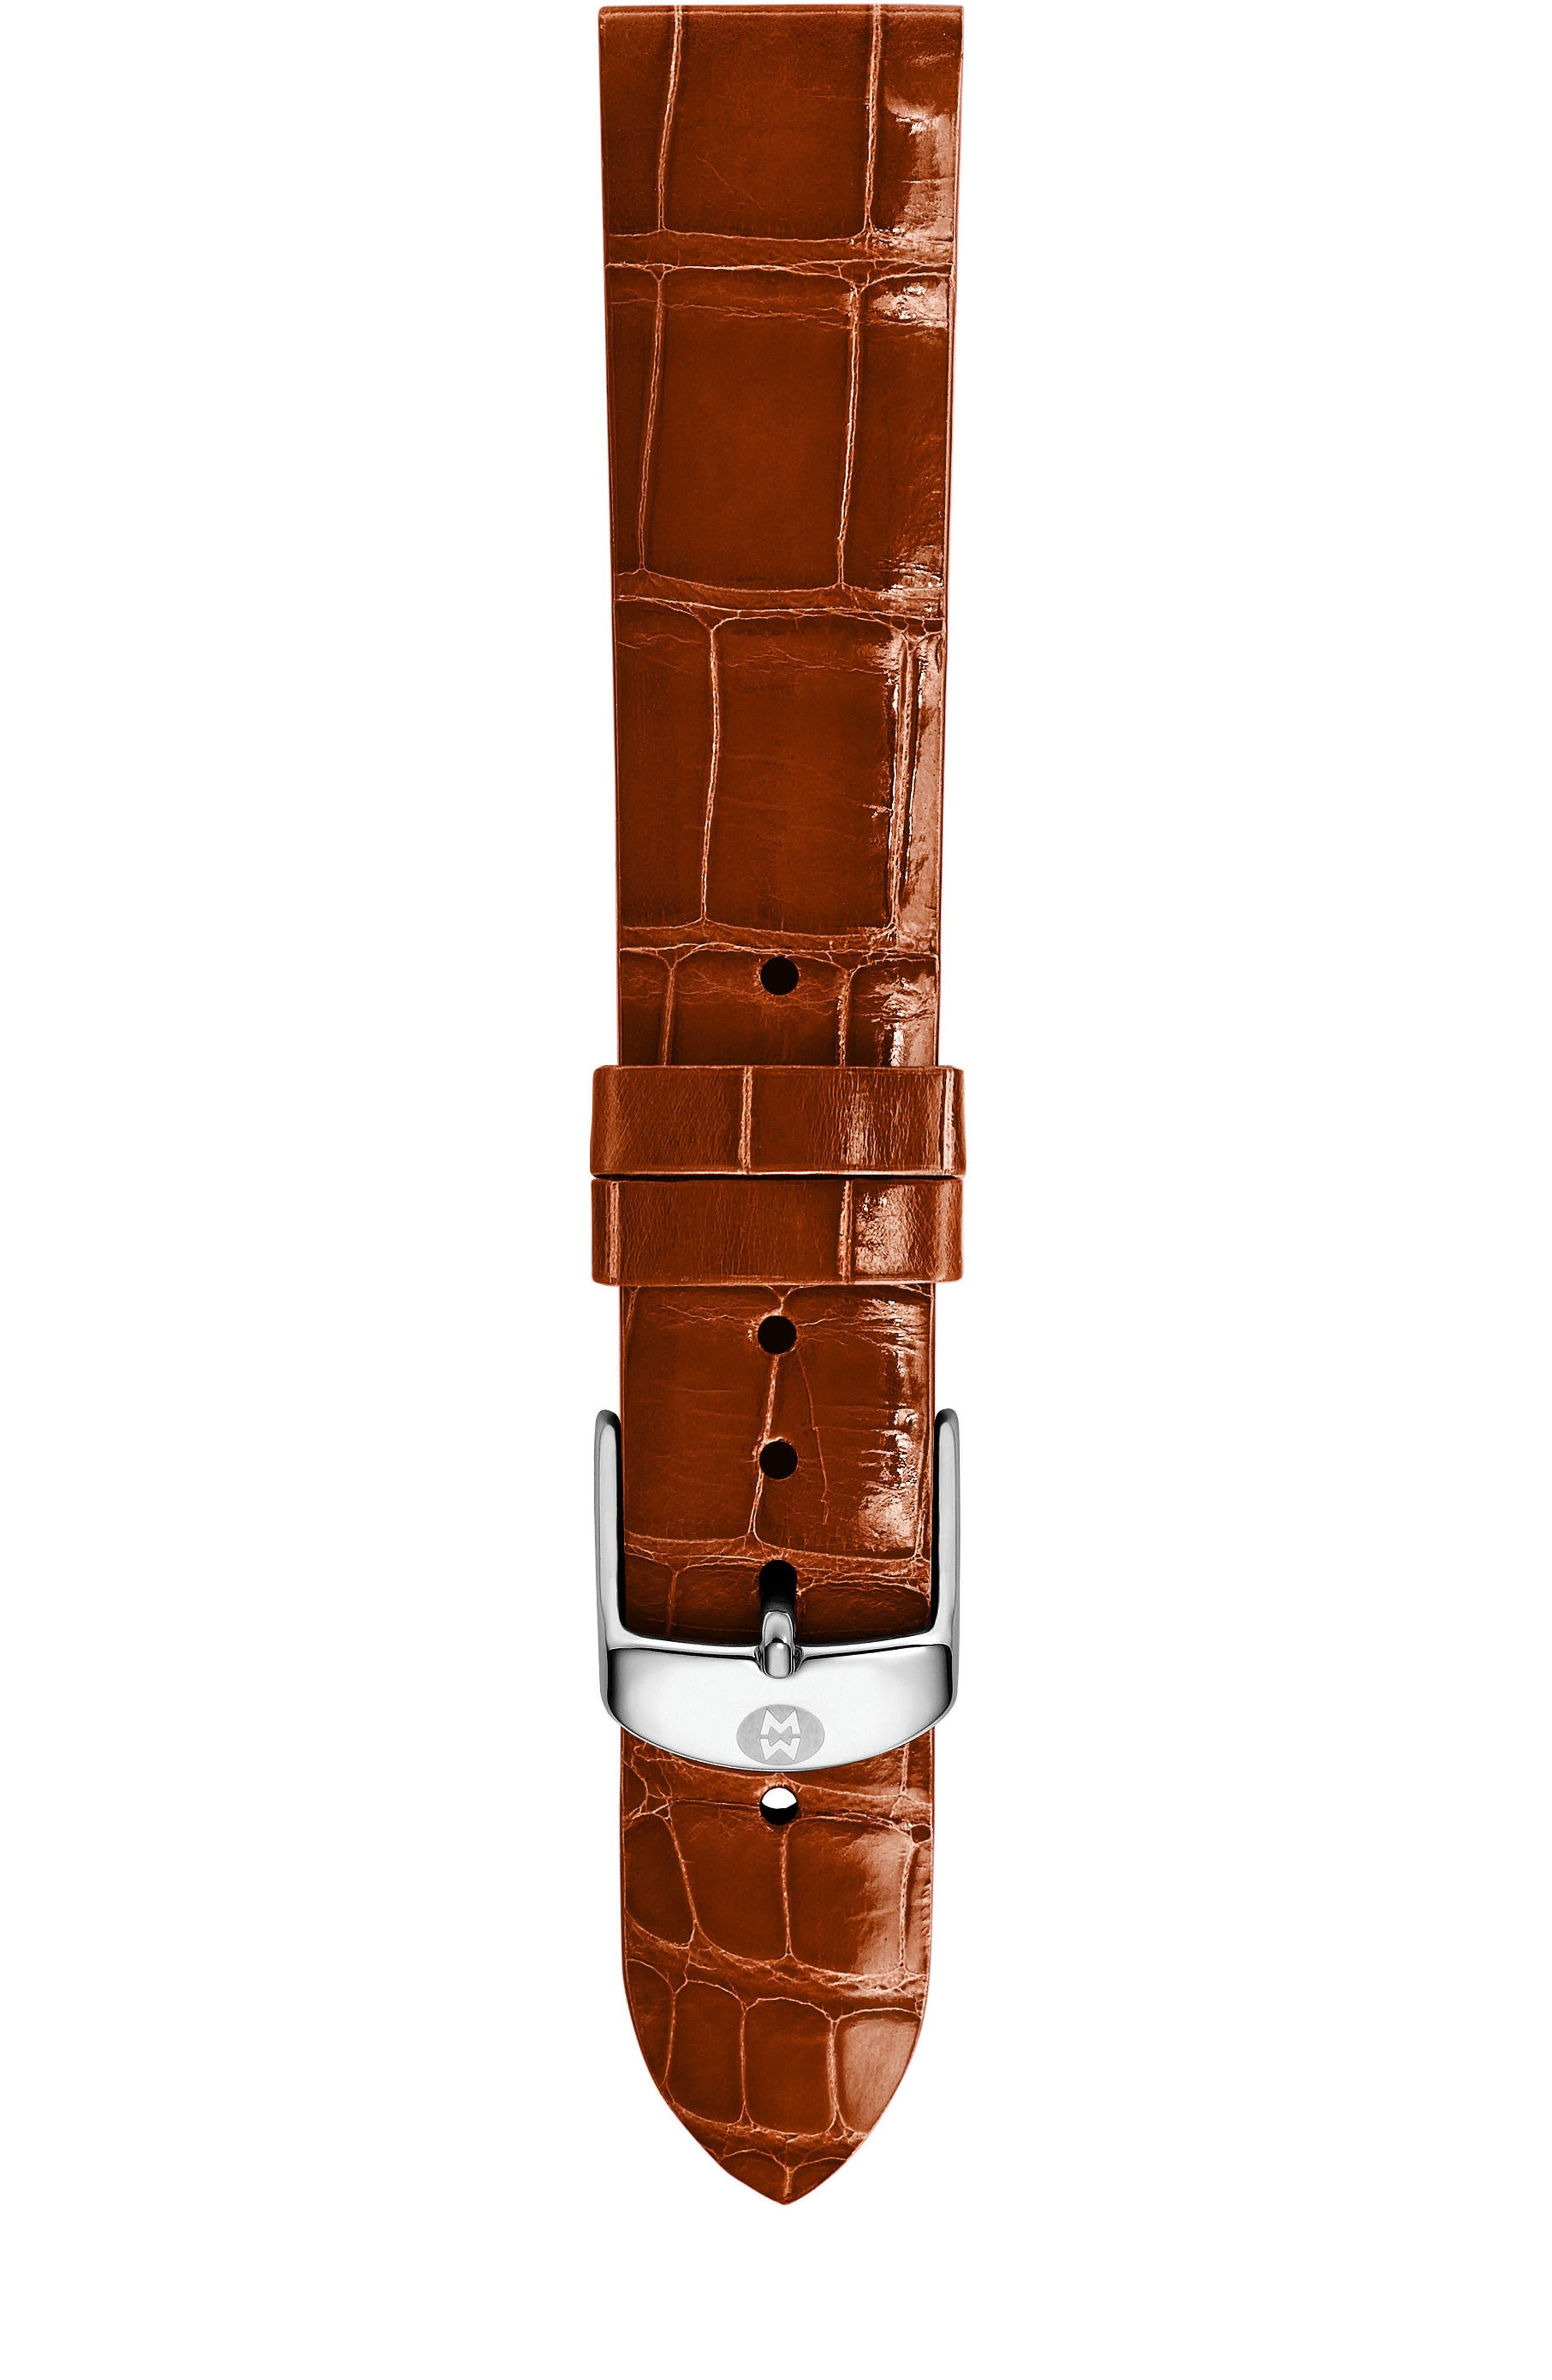 16mm Alligator Watch Strap,                         Main,                         color, 200